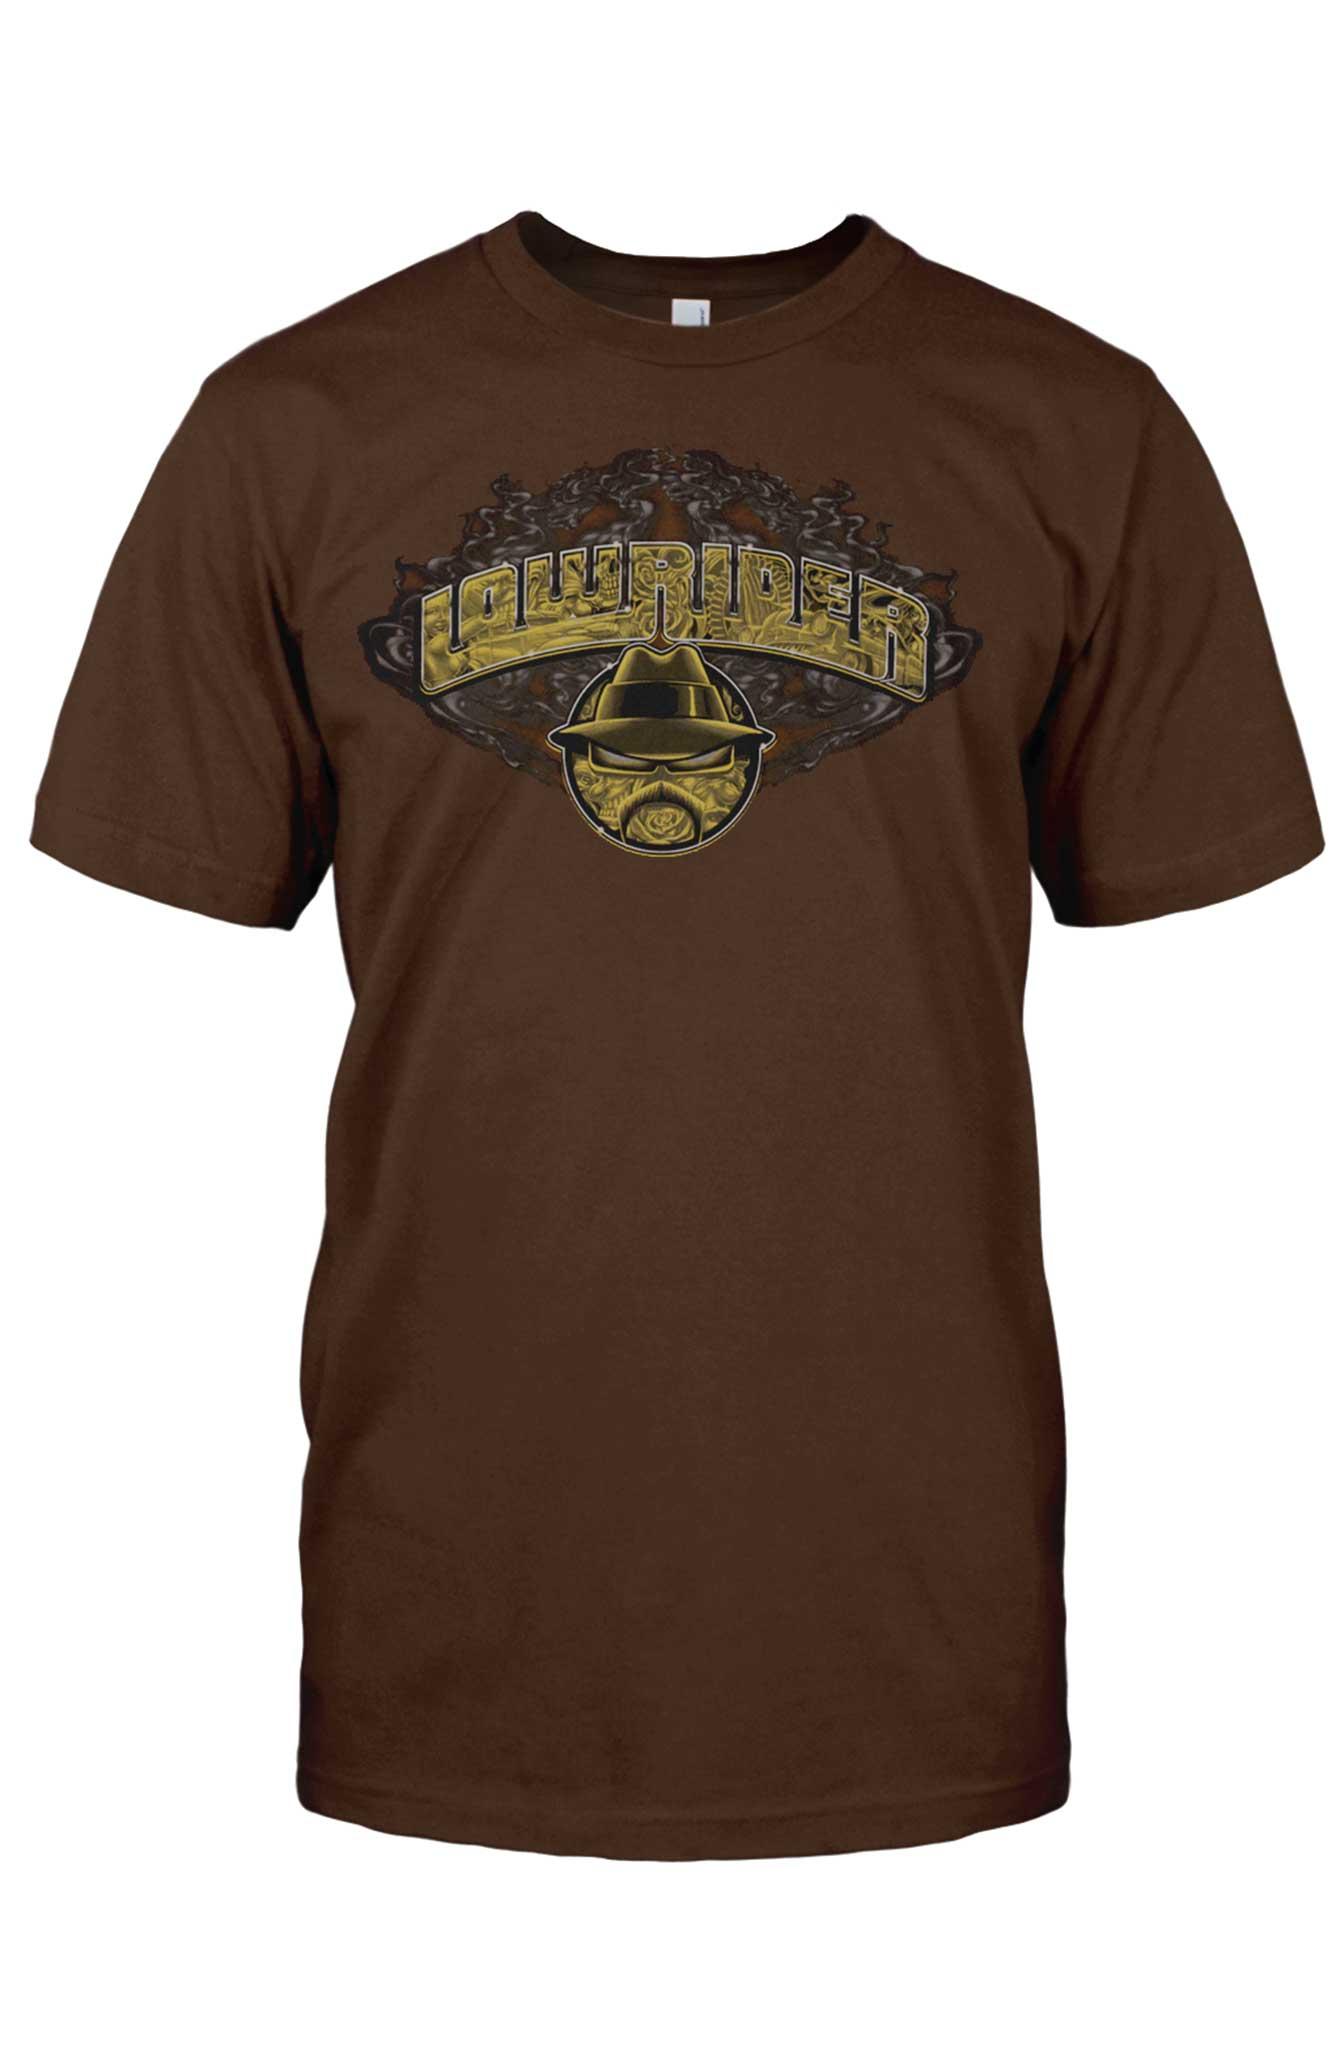 Chevy T Shirts >> New Shirts at Lowrider Clothing